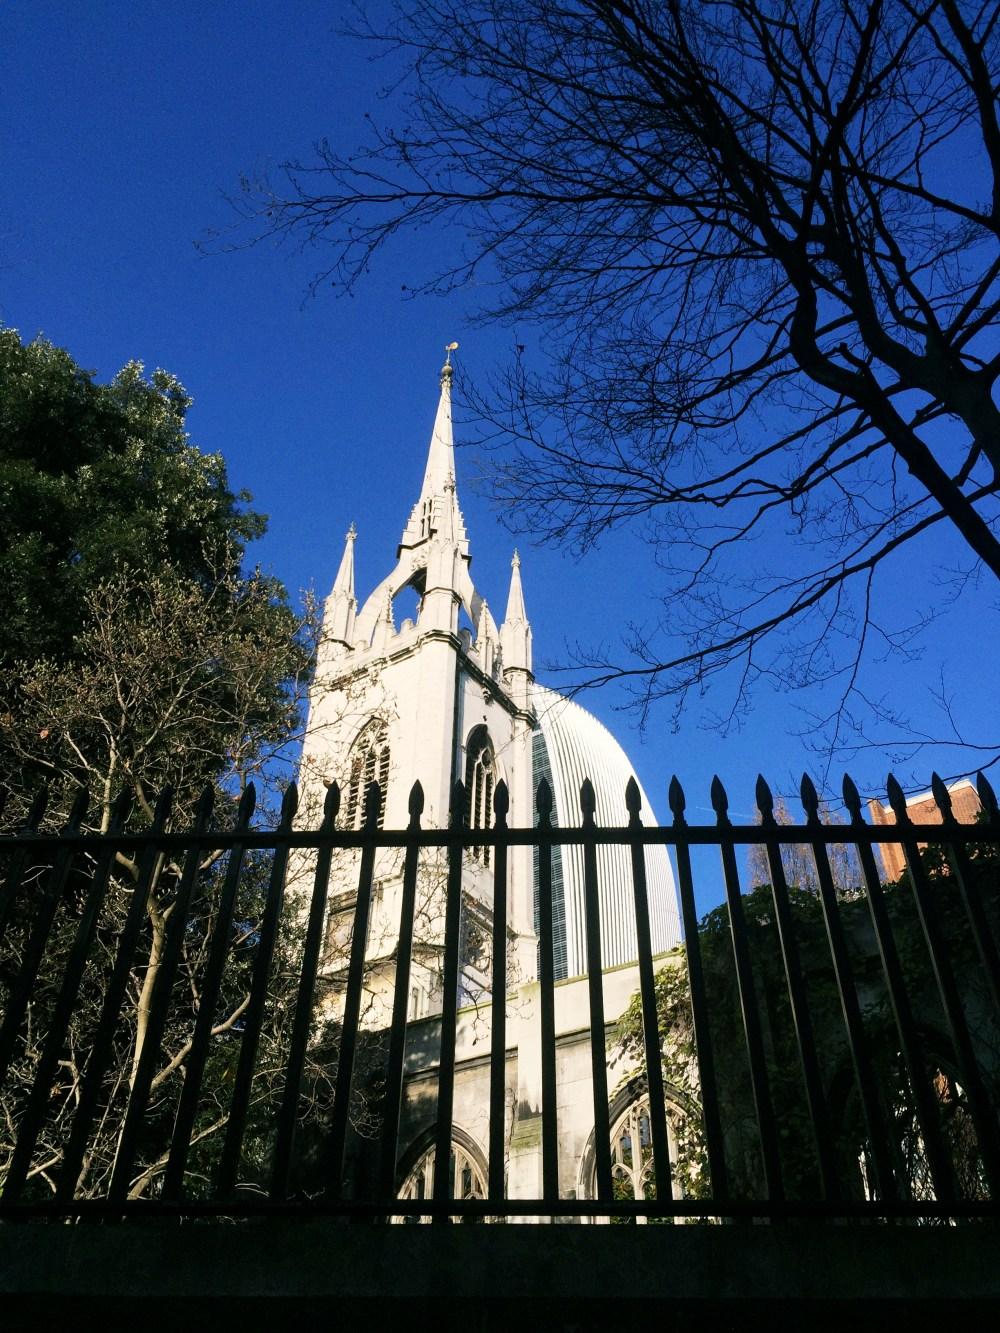 11 Dec 2016: St Dunstan in the East | London, England